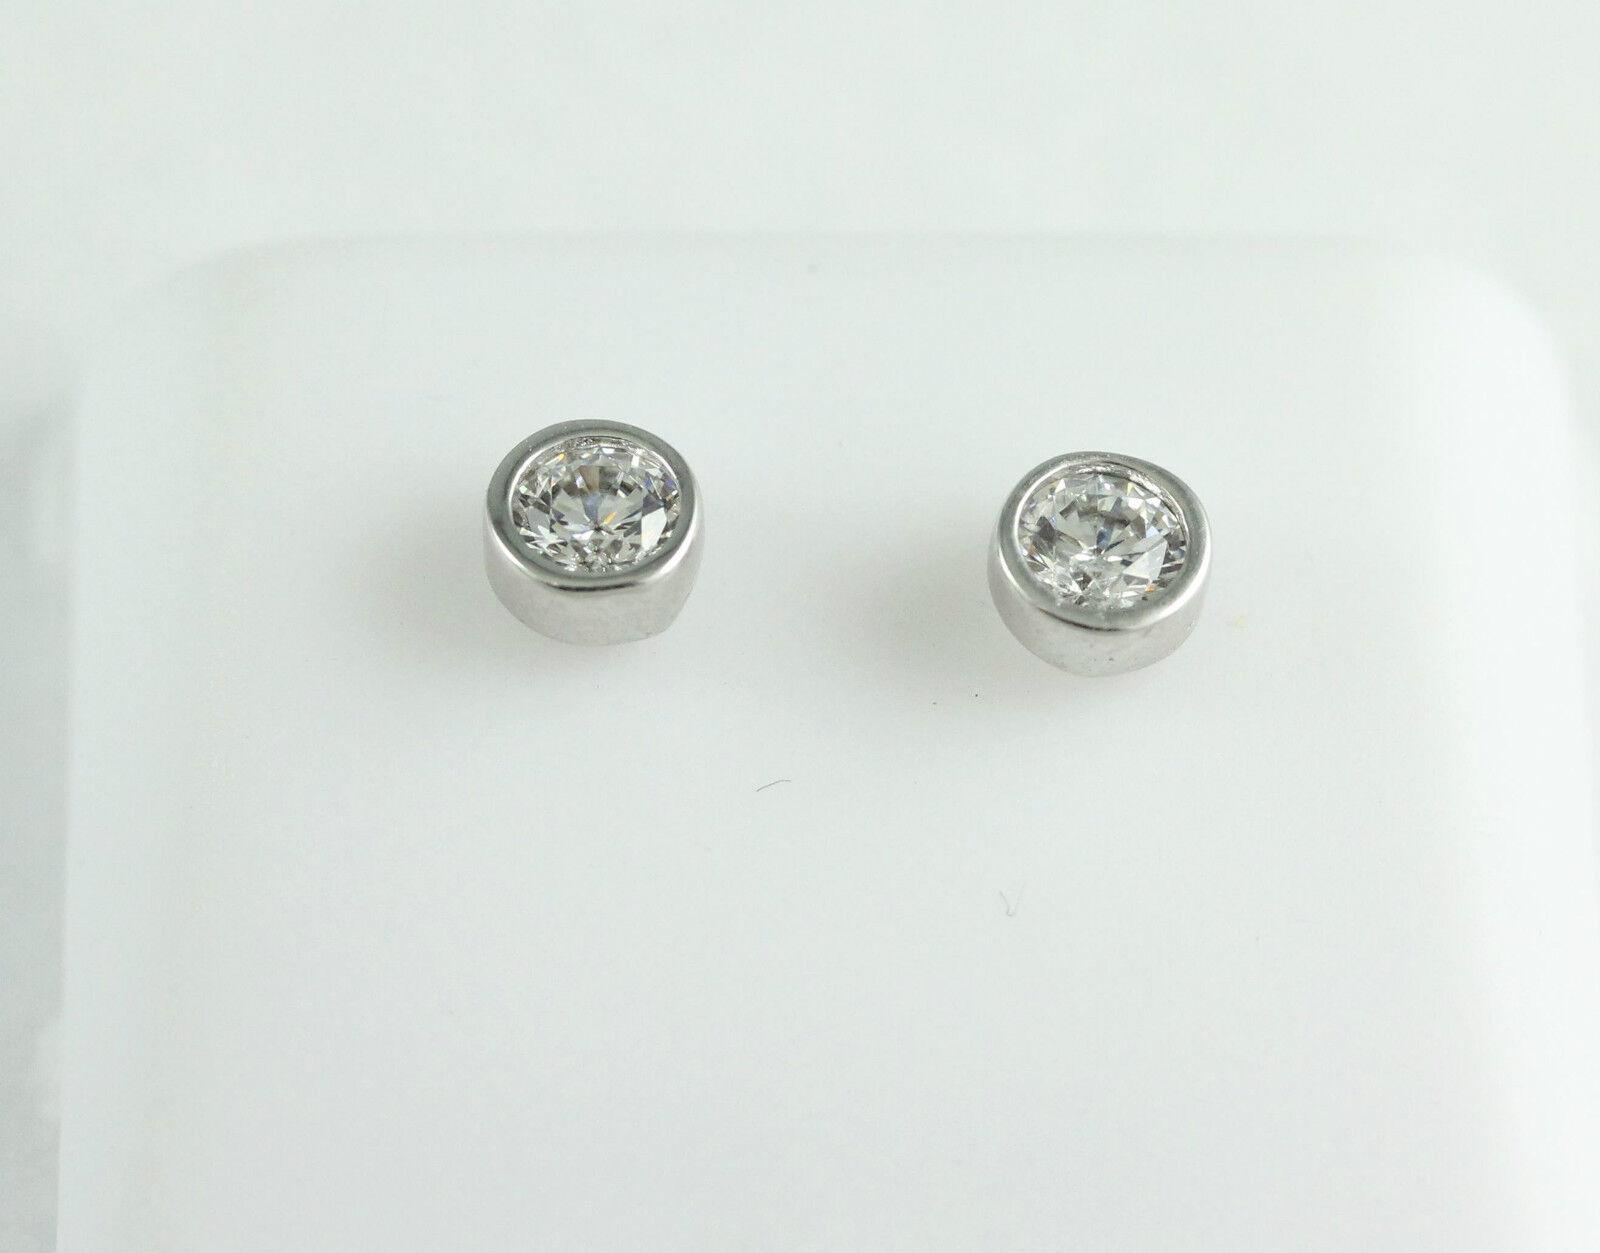 One Pair of 10k White gold Stud Earrings, (NEW round bezel set cubic, 1.0g)2876